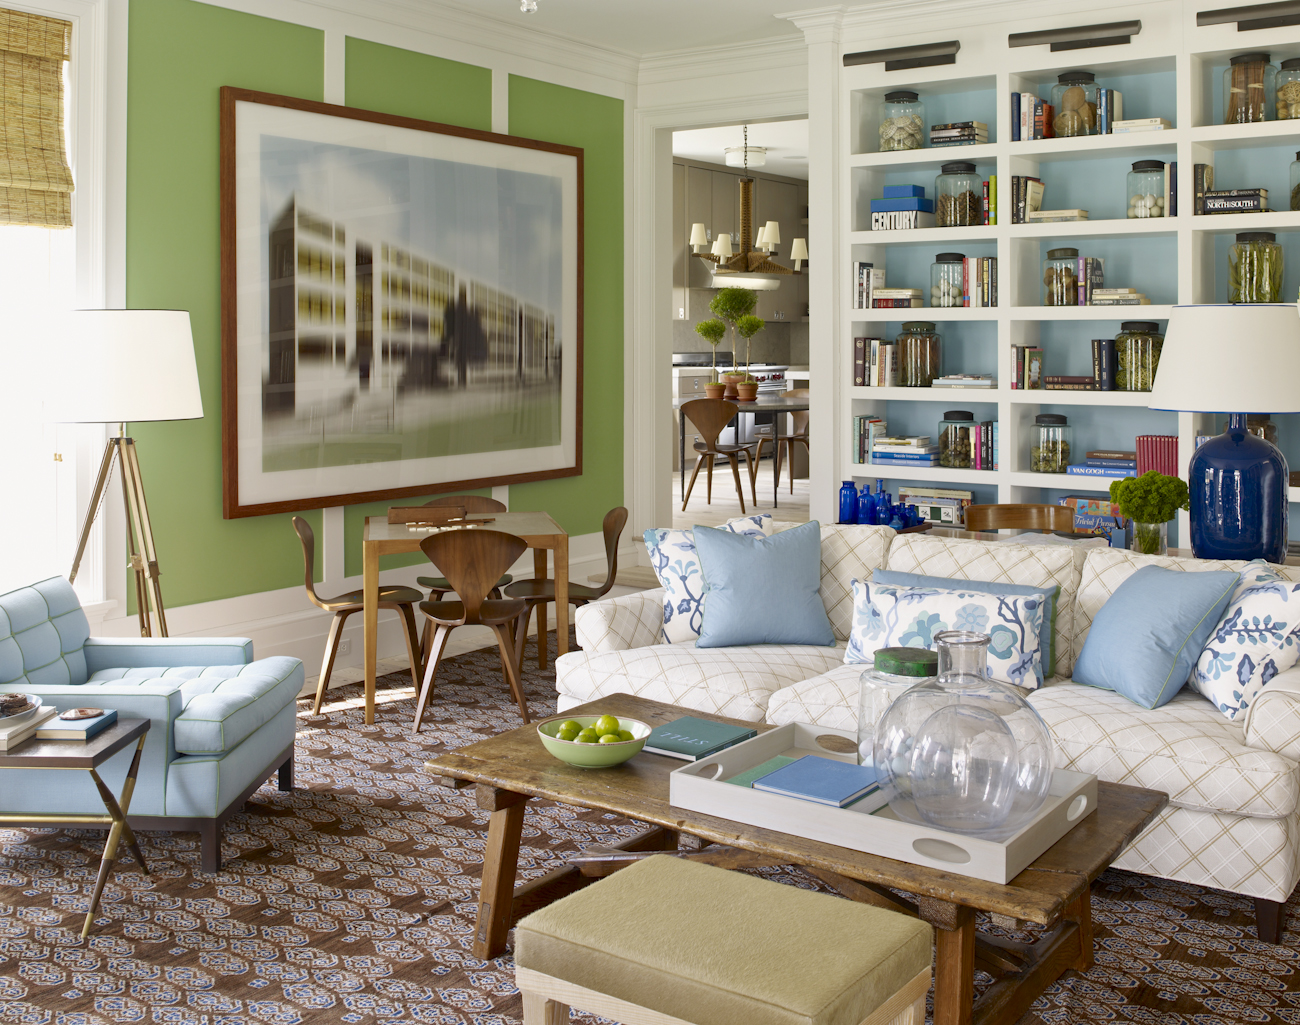 Interior design bySteven Gambrel